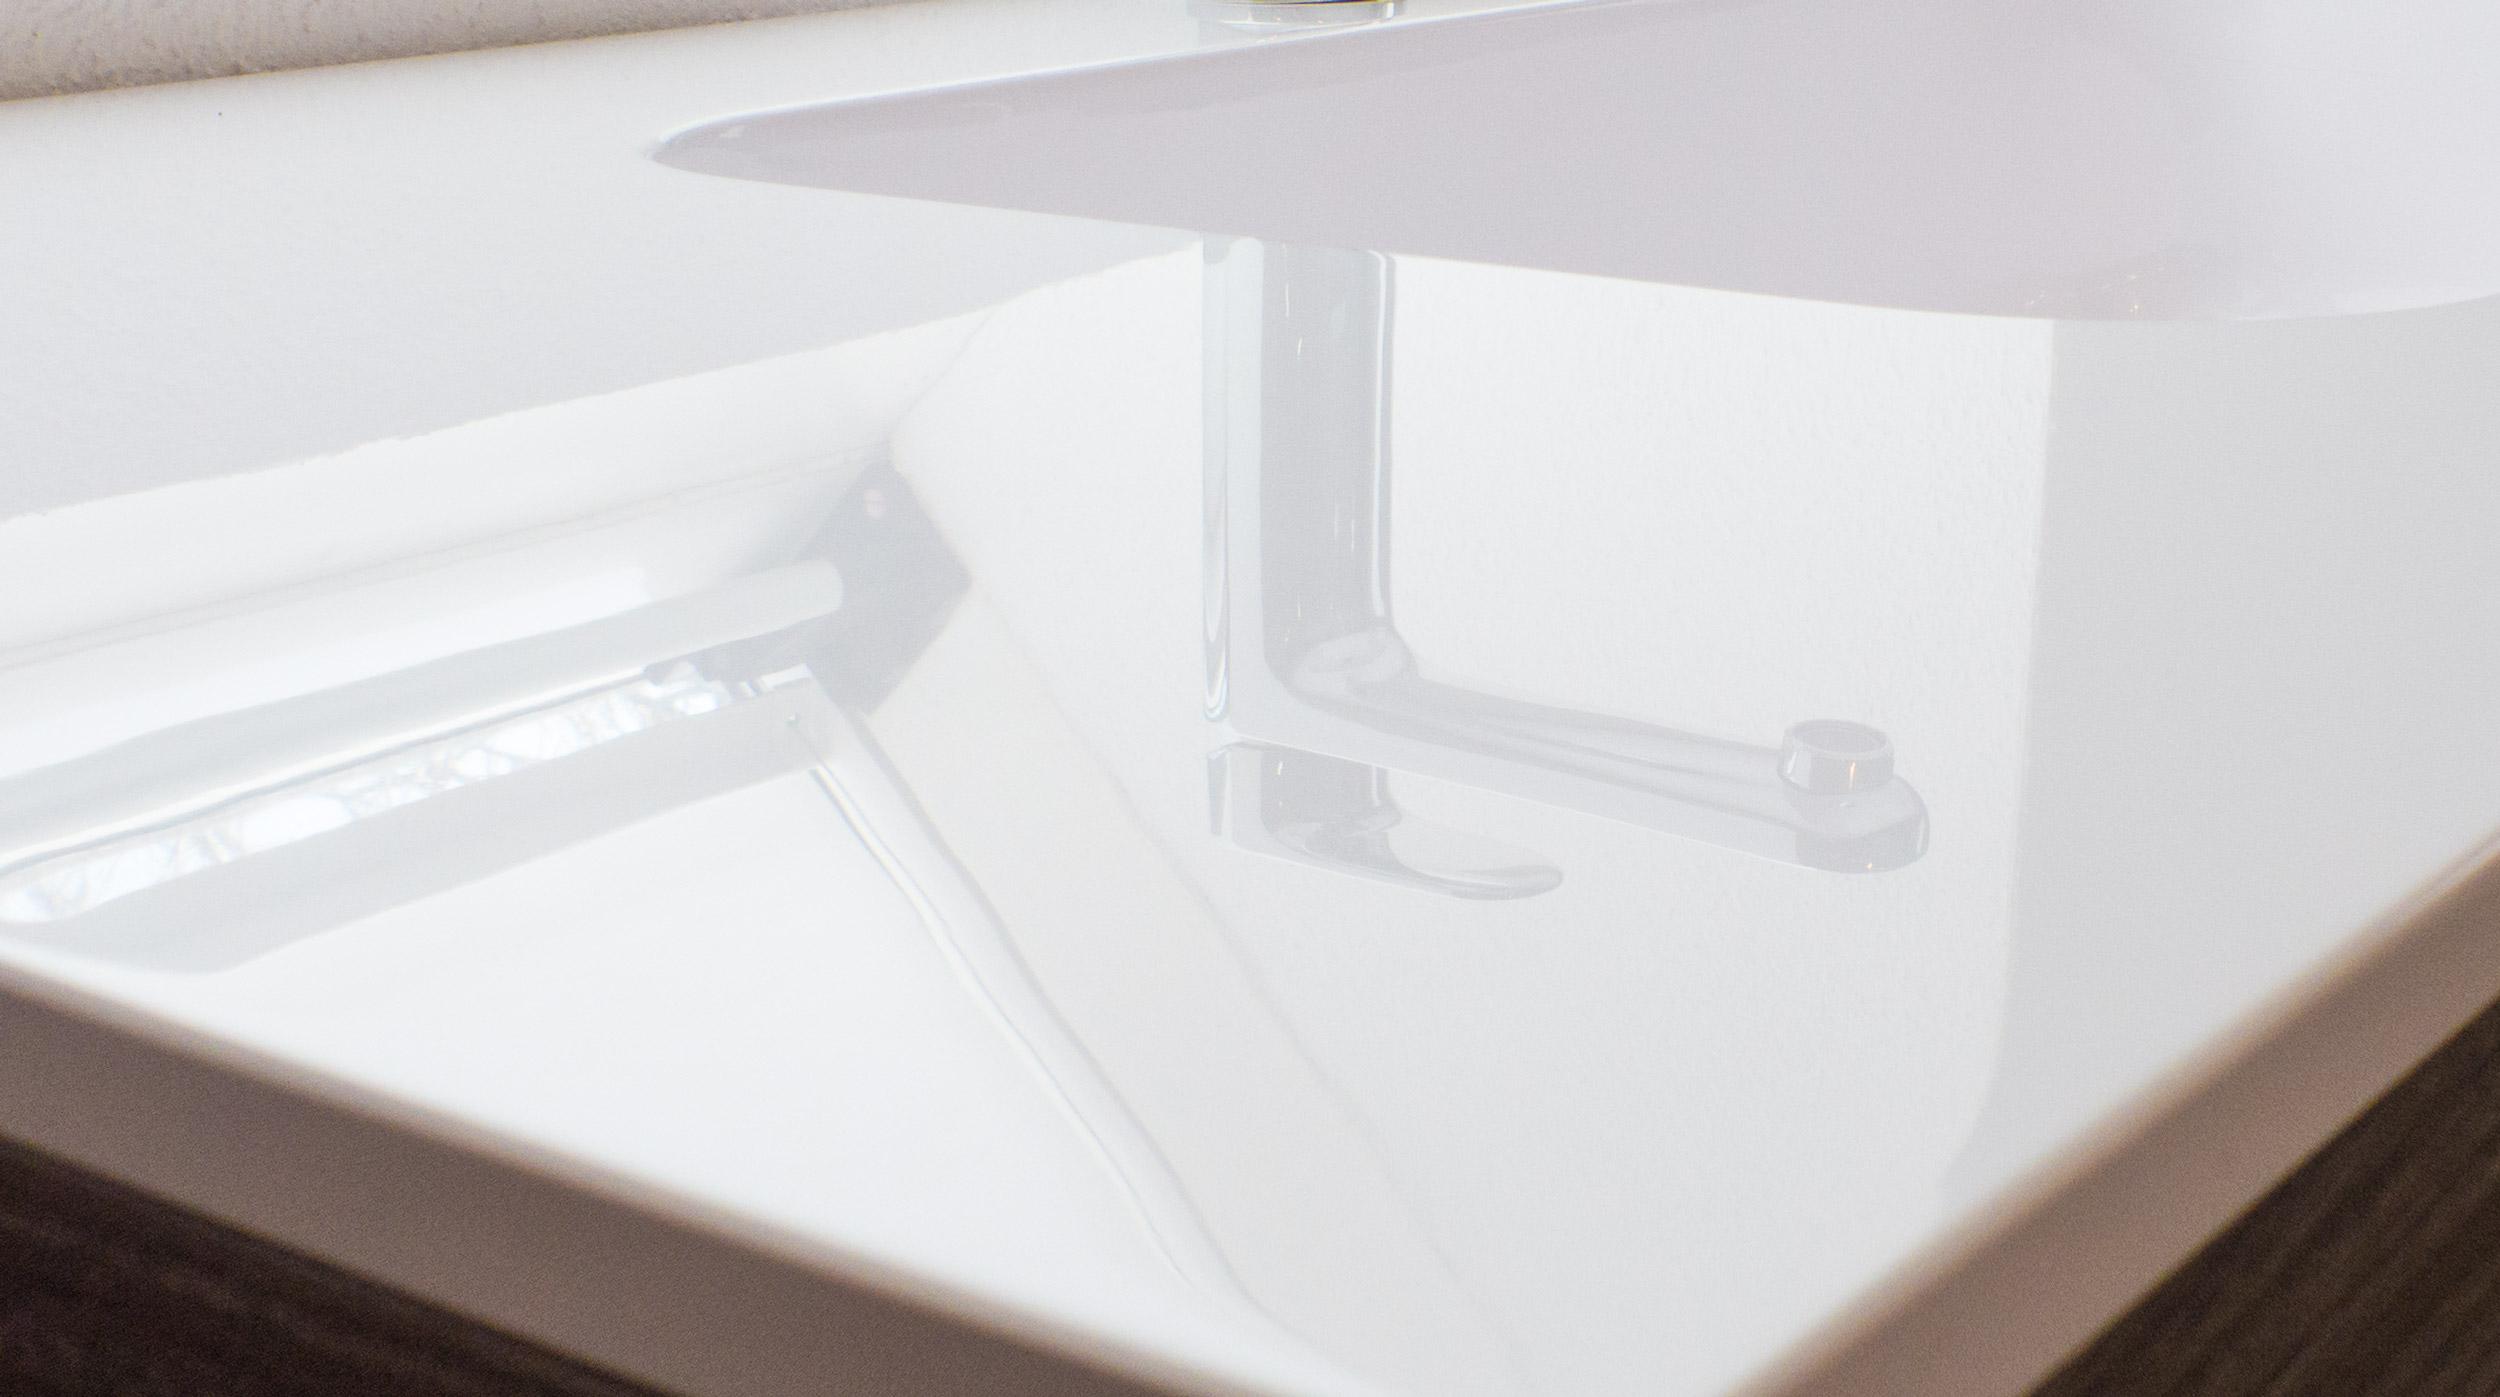 waschbecken montieren kosten amazing ratgeber waschbecken montieren position der markieren with. Black Bedroom Furniture Sets. Home Design Ideas